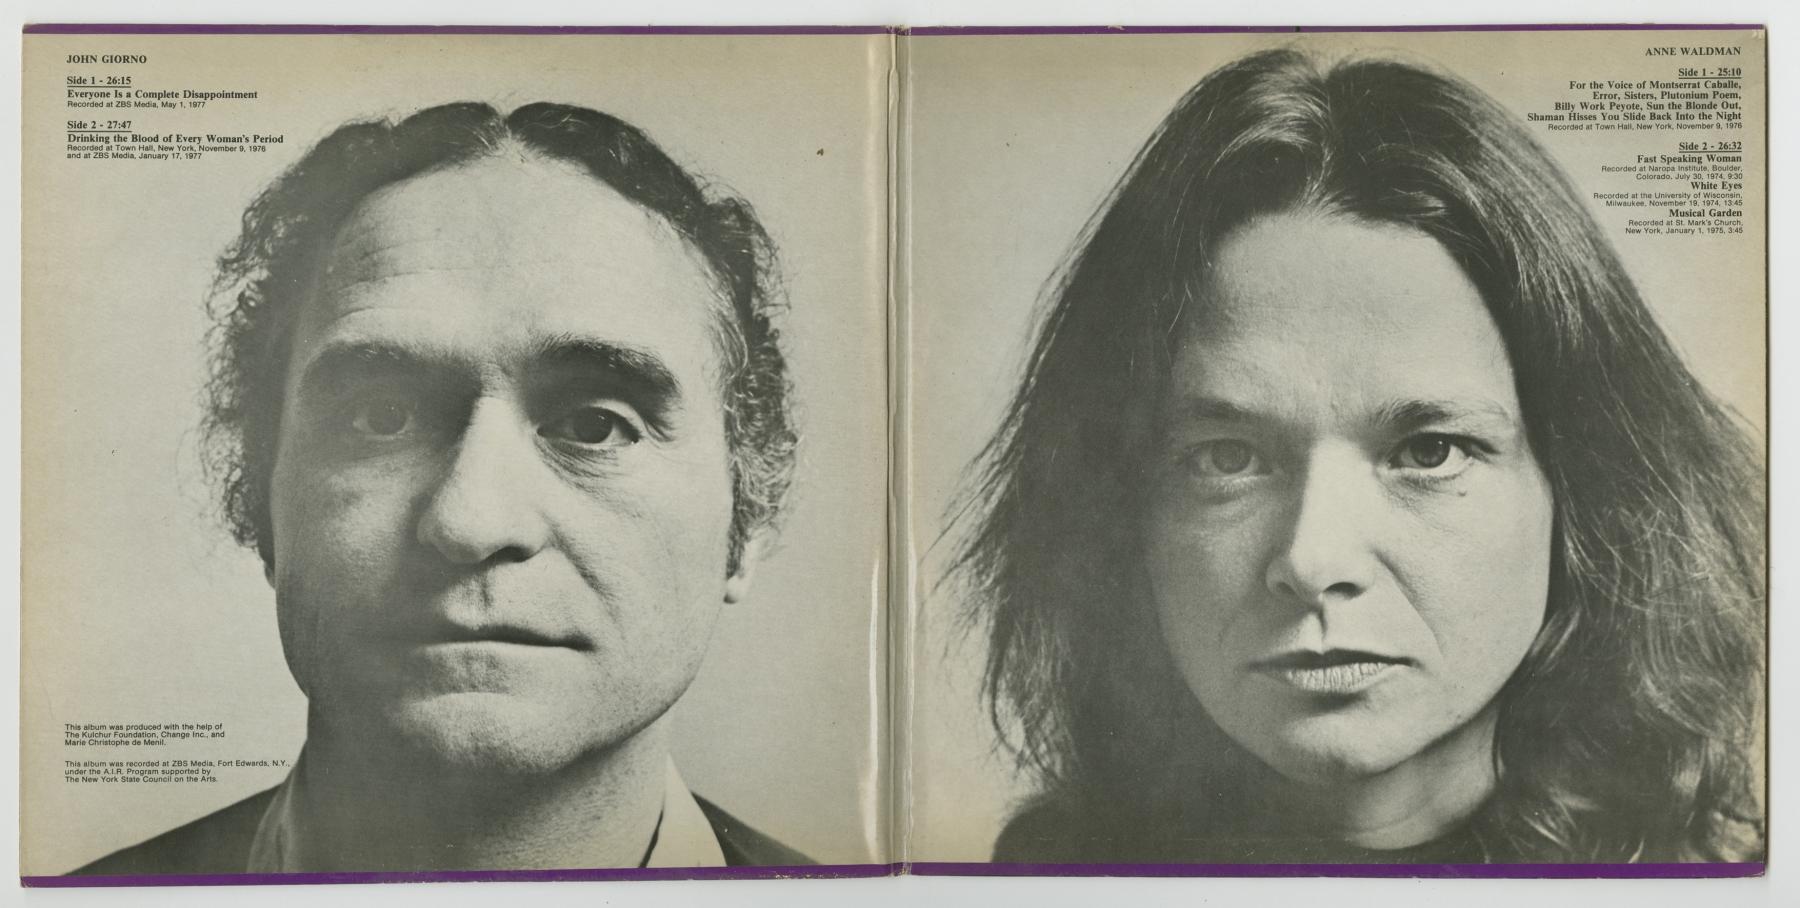 John Giorno and Anne Waldman: A Kulchur Selection (1977), inside spread